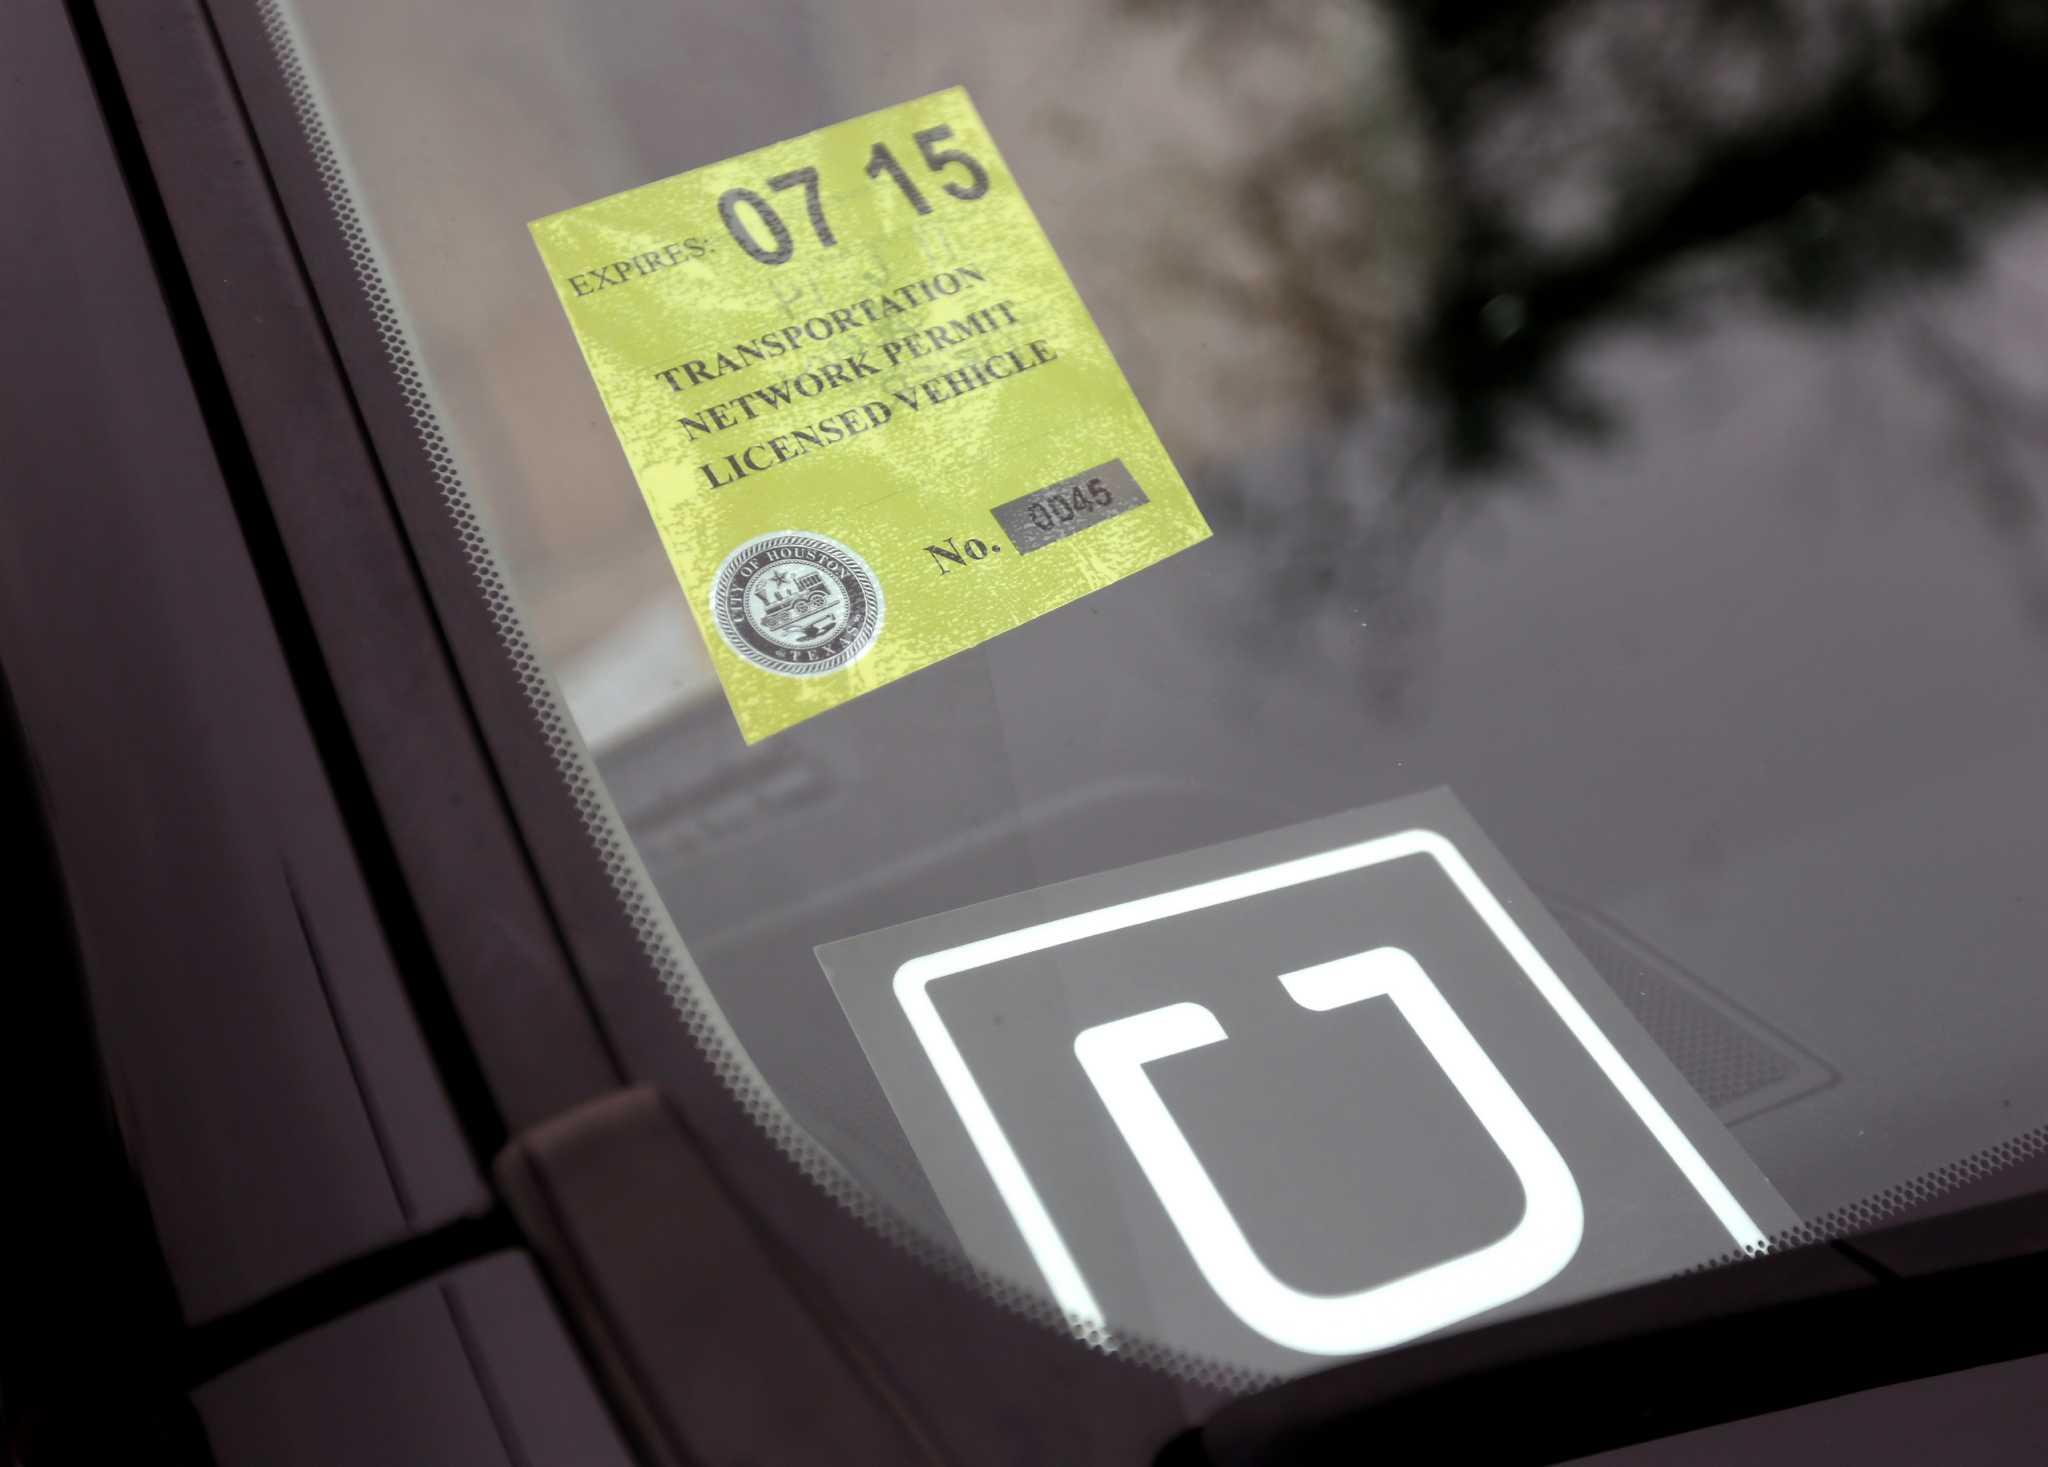 City of houstons uber driver checks reveal numerous crimes